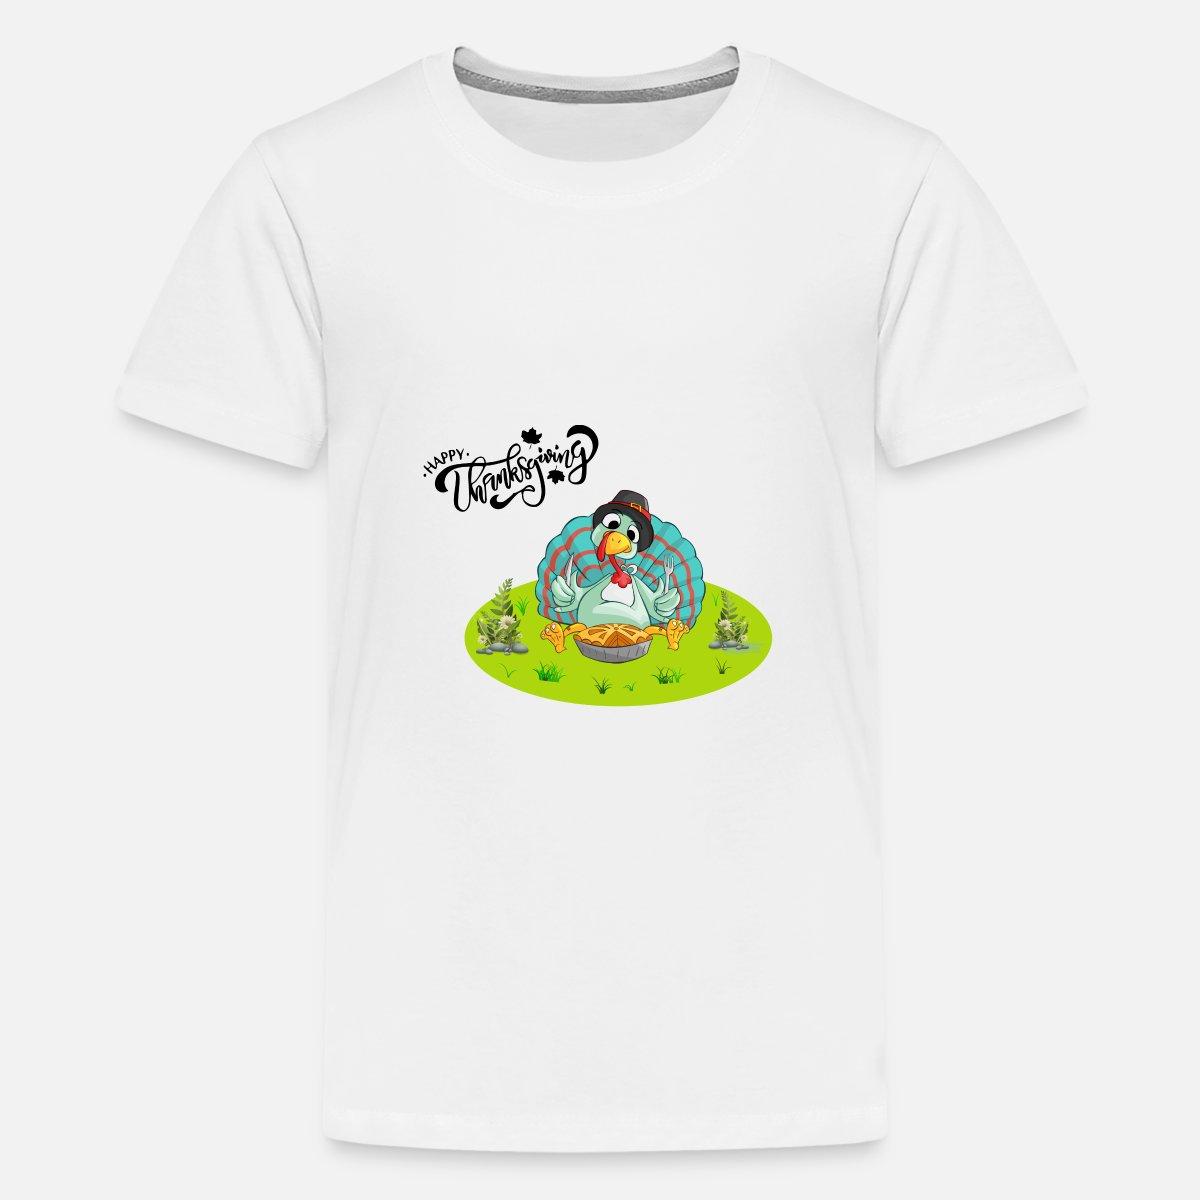 d3adc55590 Garden Themed Tee Shirts - DREAMWORKS